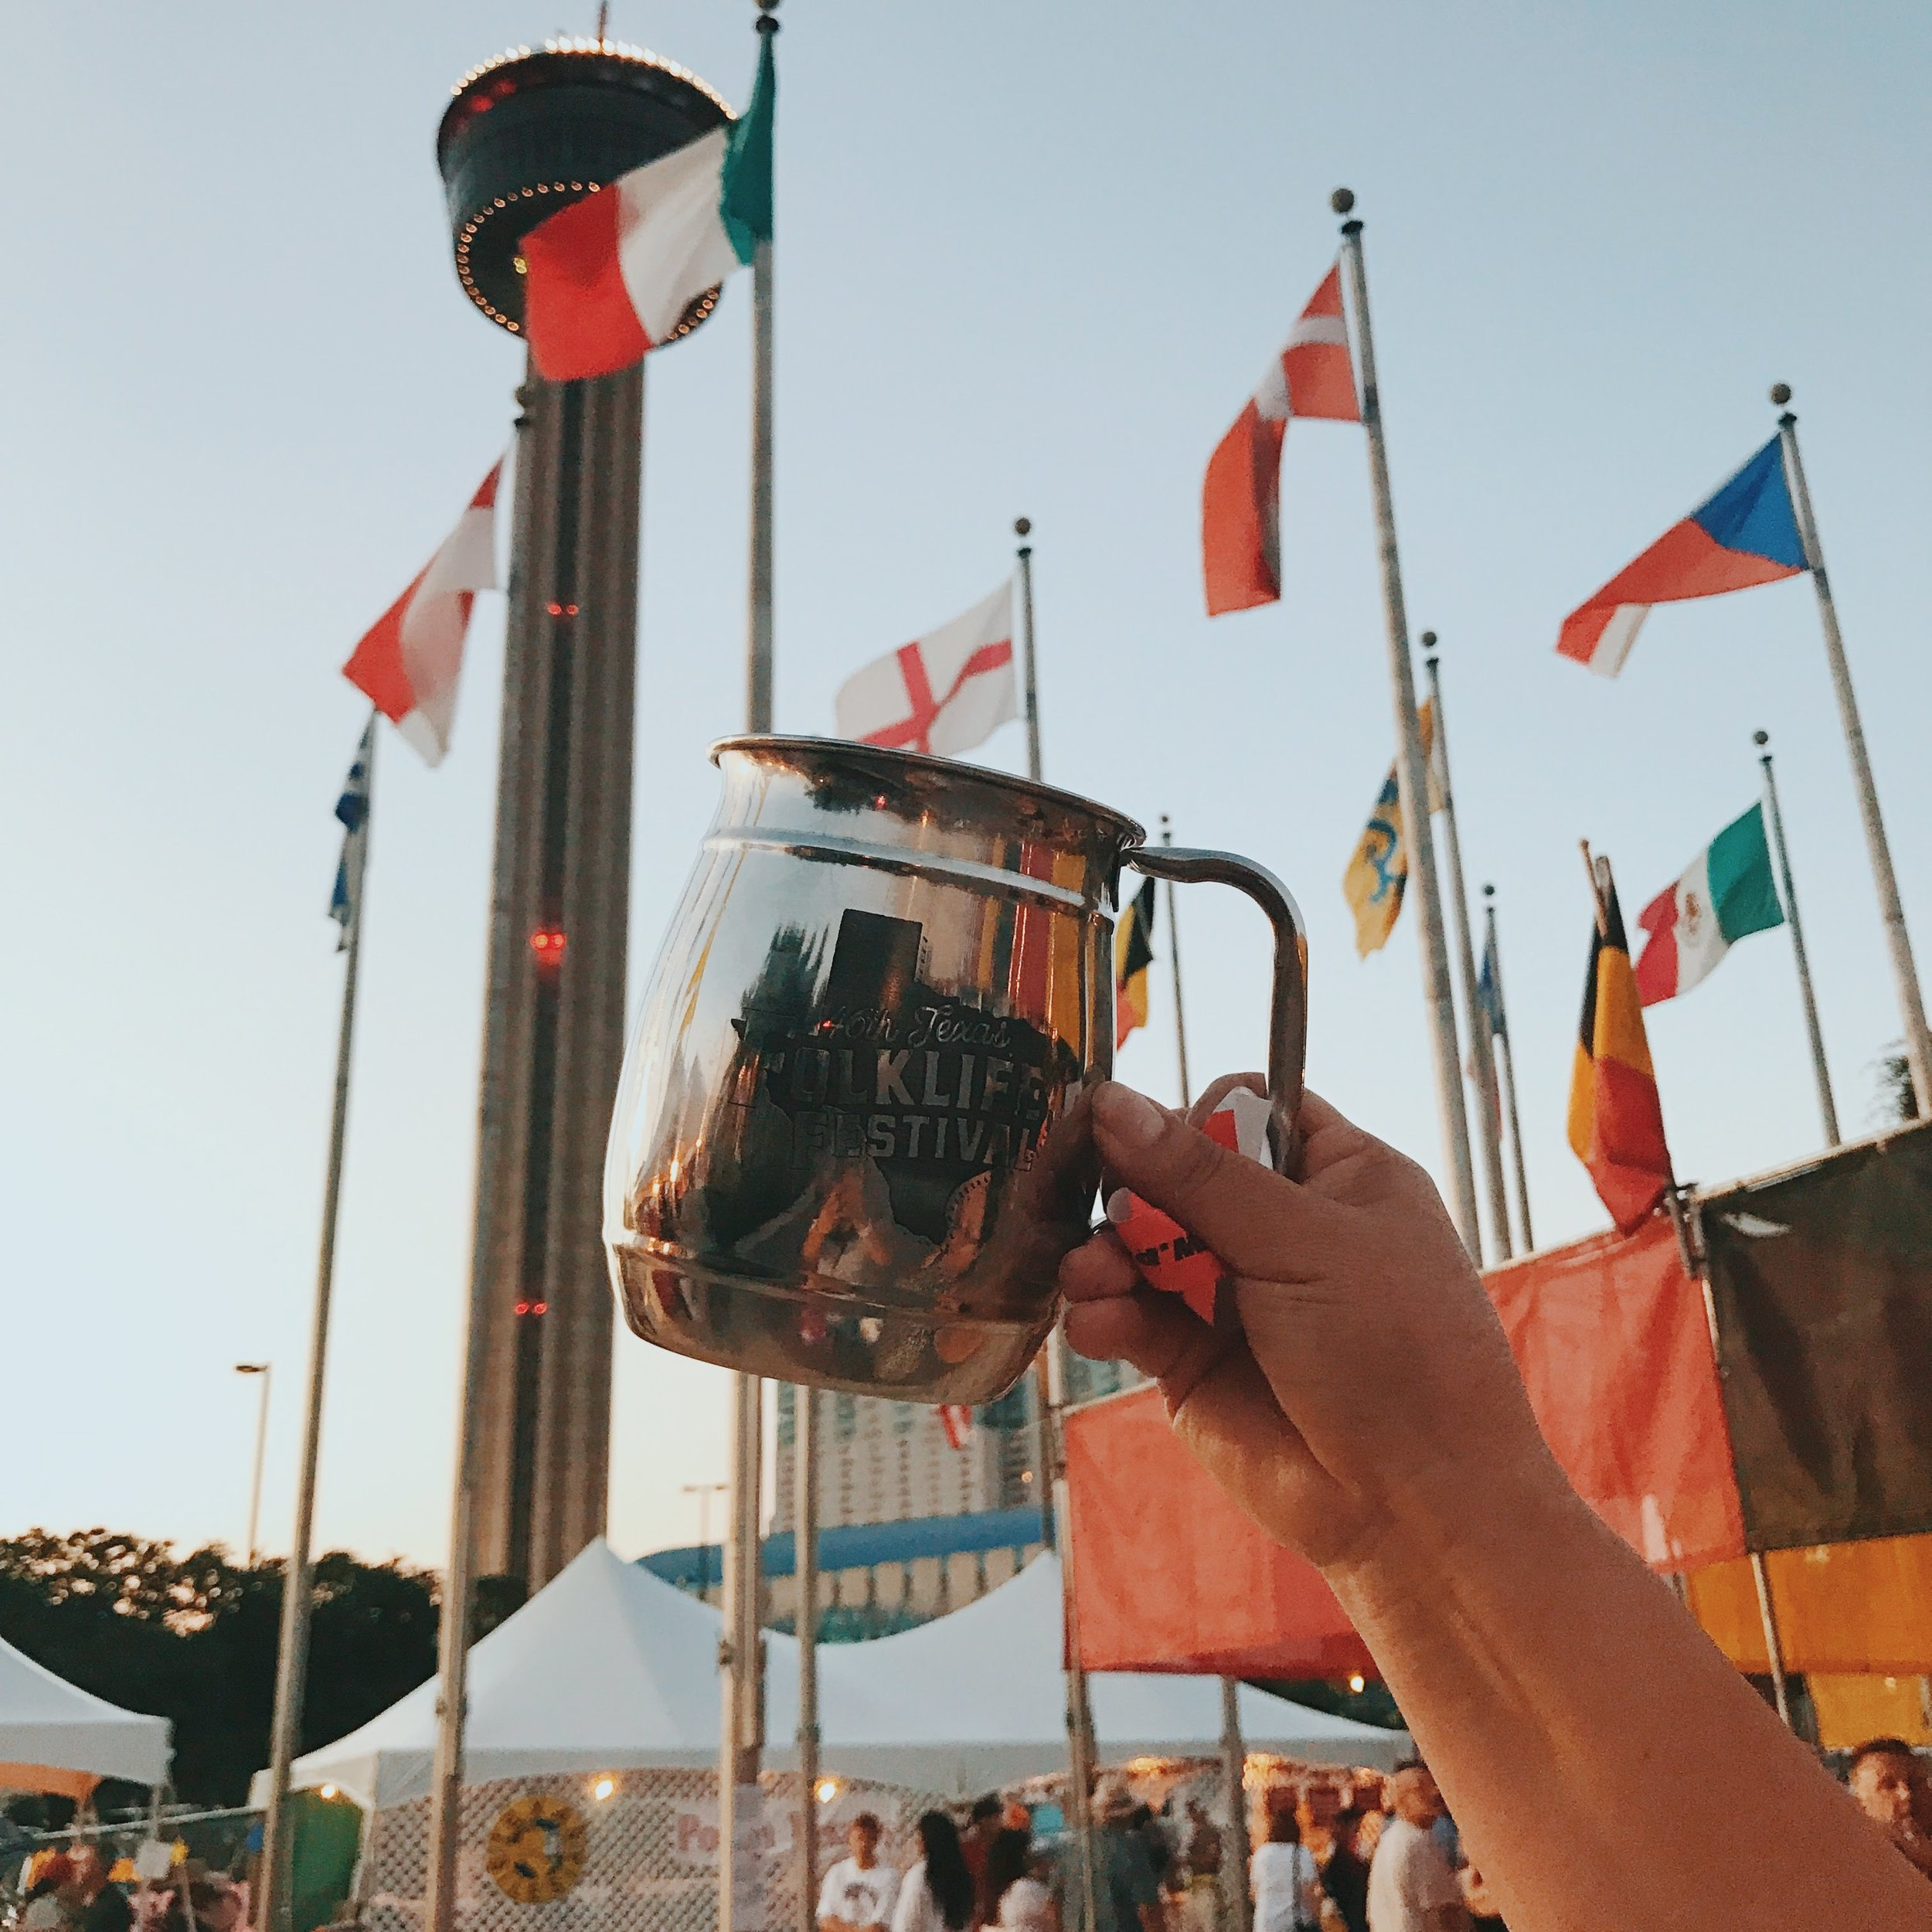 Folklife Festival in San Antonio, TX